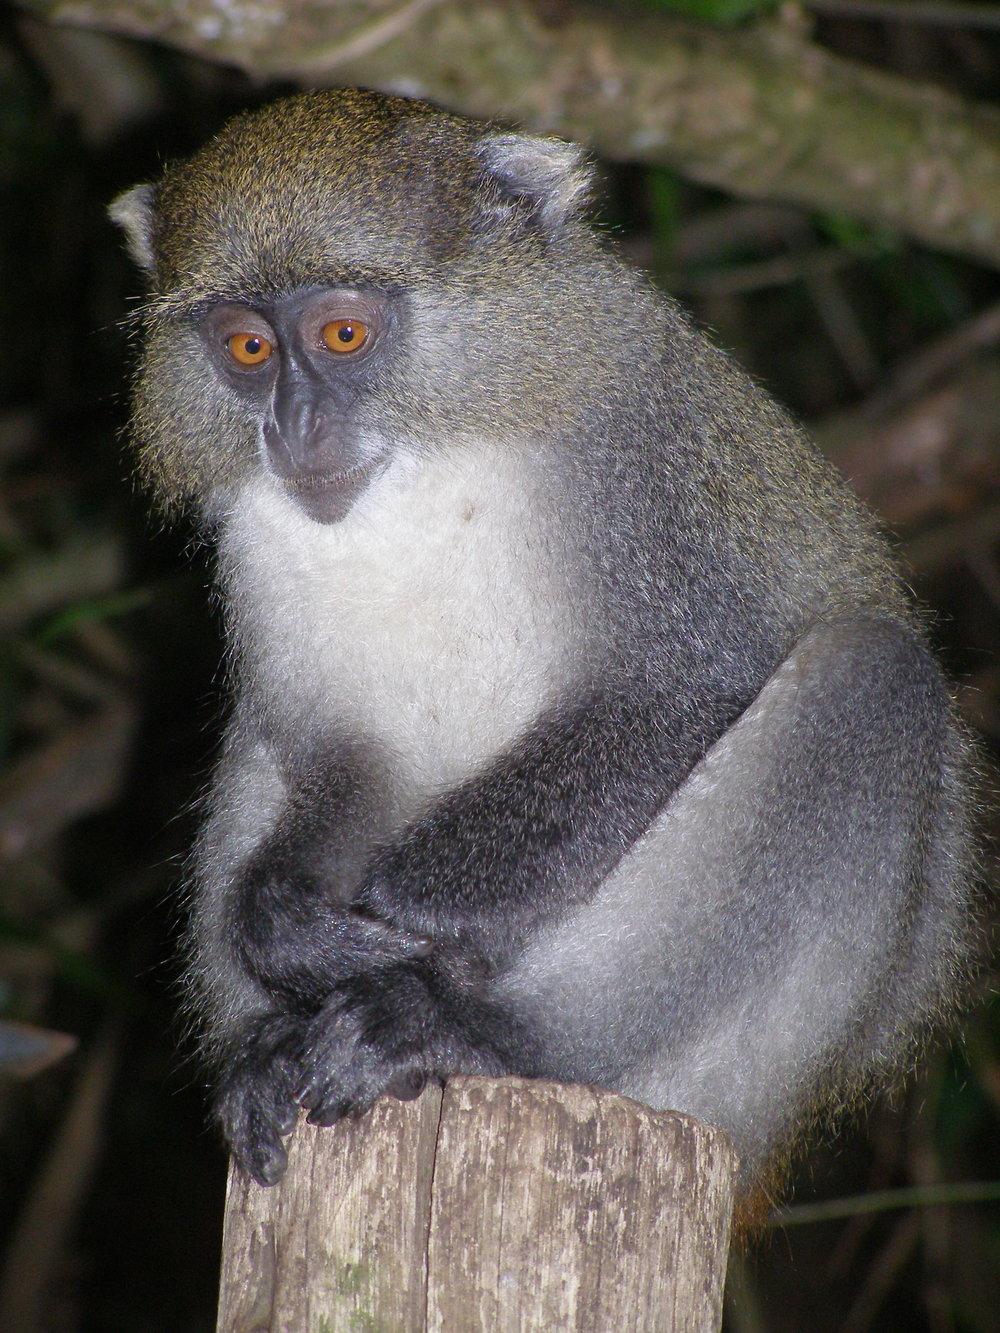 Juvenile Samango monkey ( Cercopithecus mitis erythrarchus ). Photo: M.J. Lawes